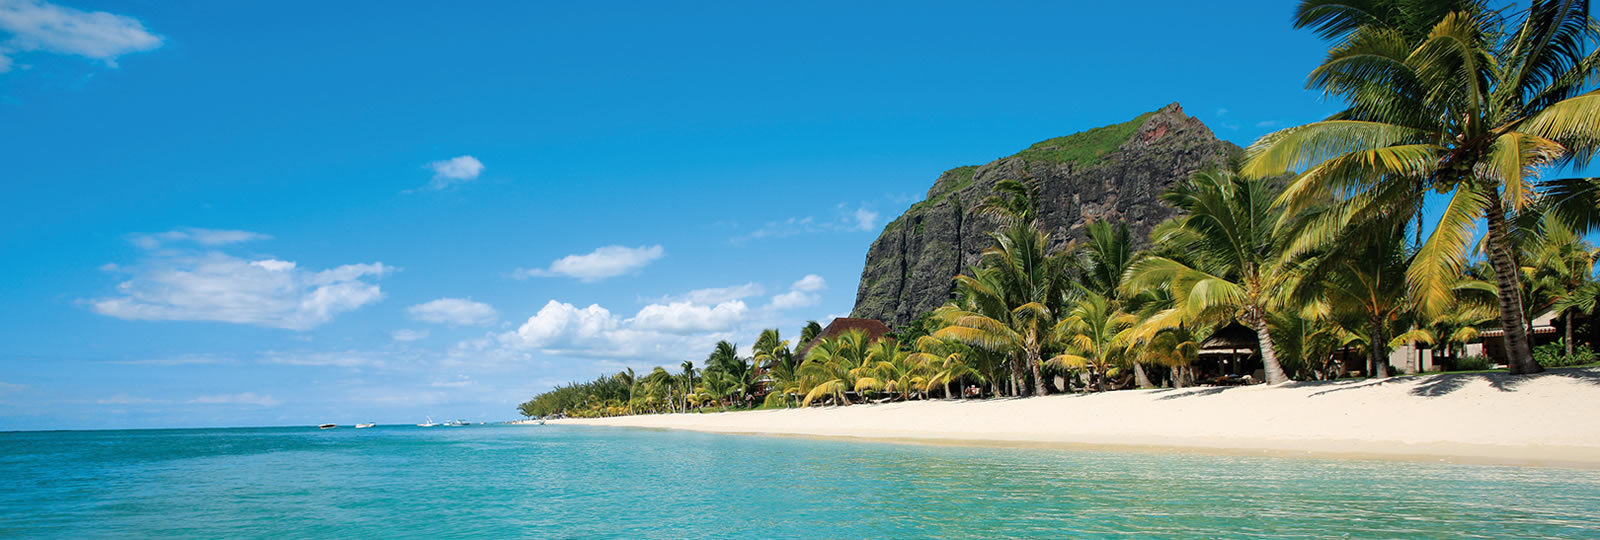 File Lux Le Morne 5 Hotel In Mauritius Jpg Wikimedia